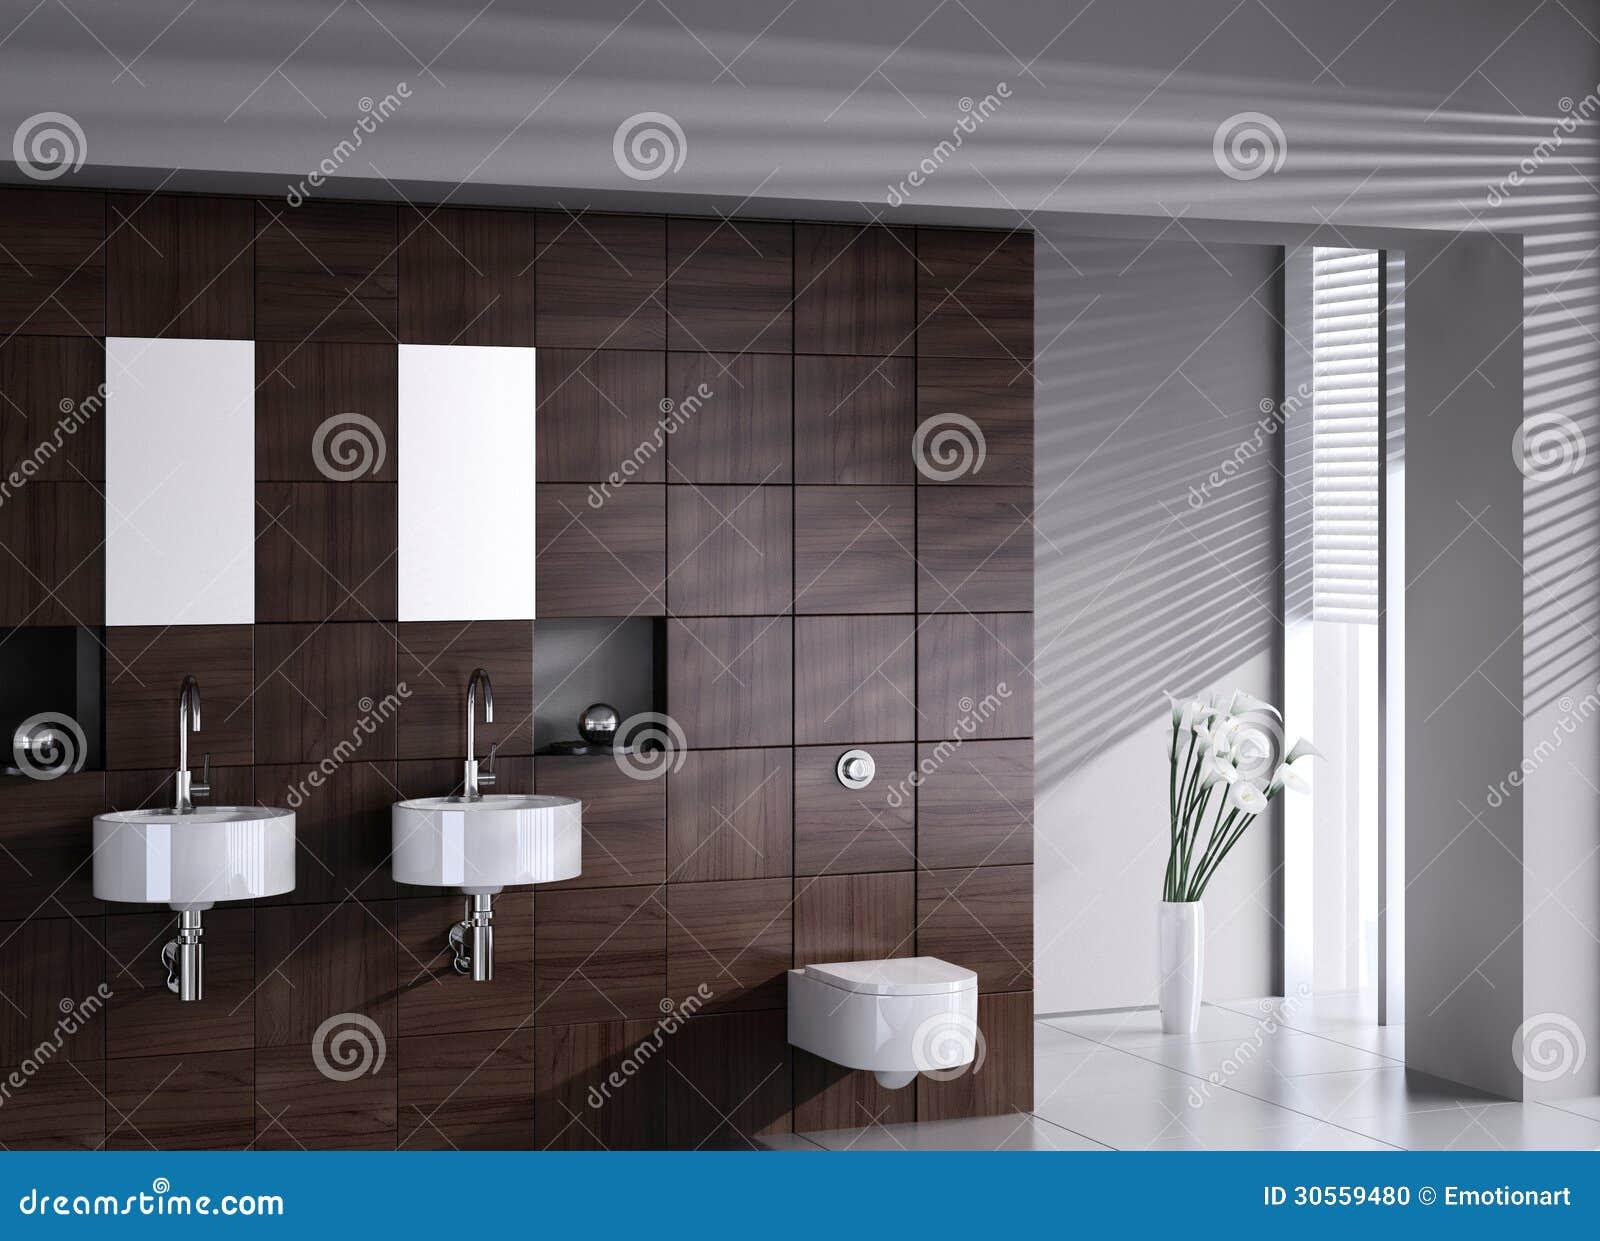 modern-dubbel-handfat-med-toaletten-30559480.jpg